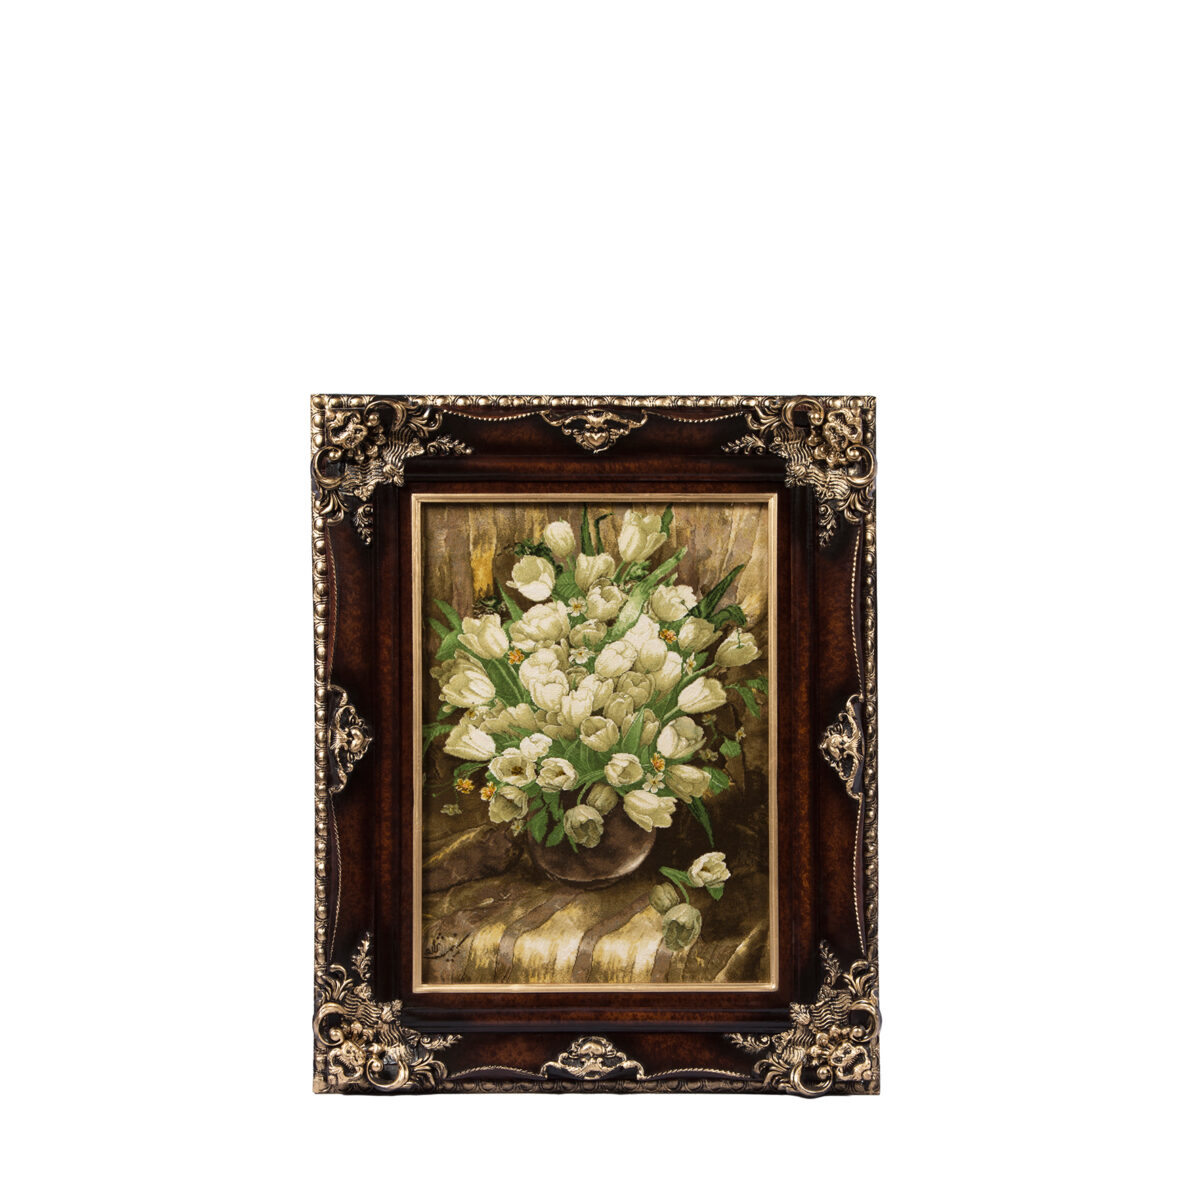 تابلو فرش دستباف طرح گل لاله کد C111